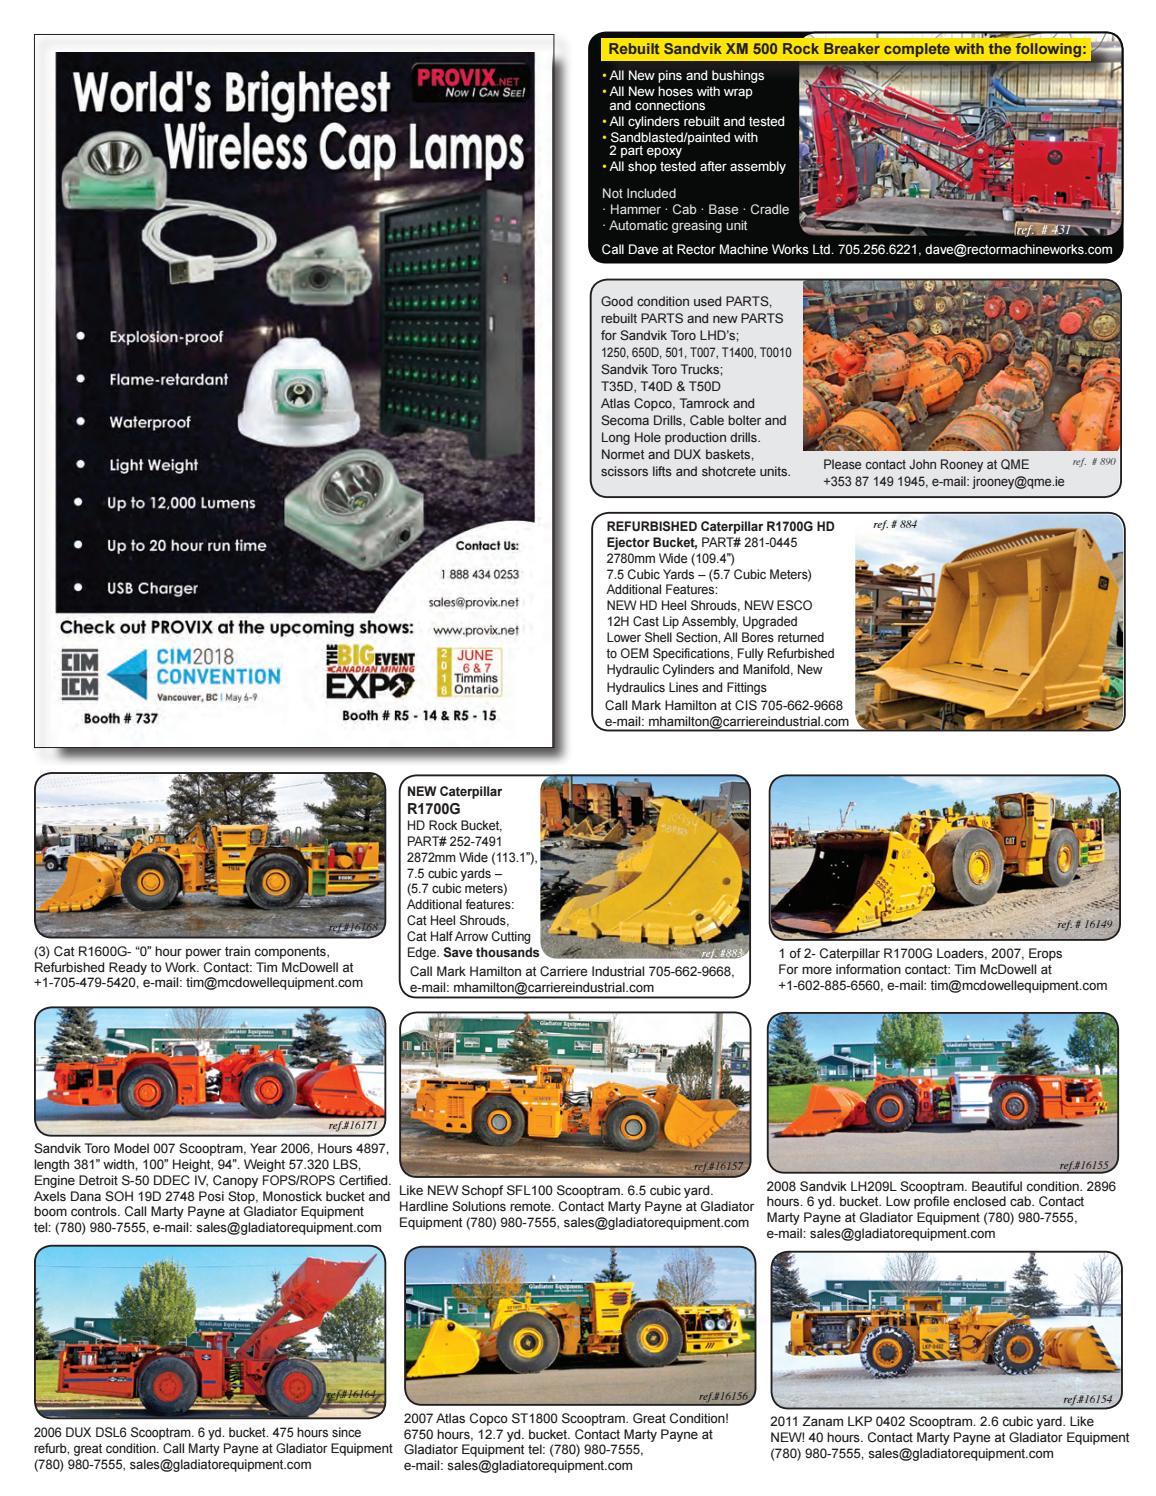 Mining Equipment Buyers Catalogue v63, Q2 2018 by The Mining